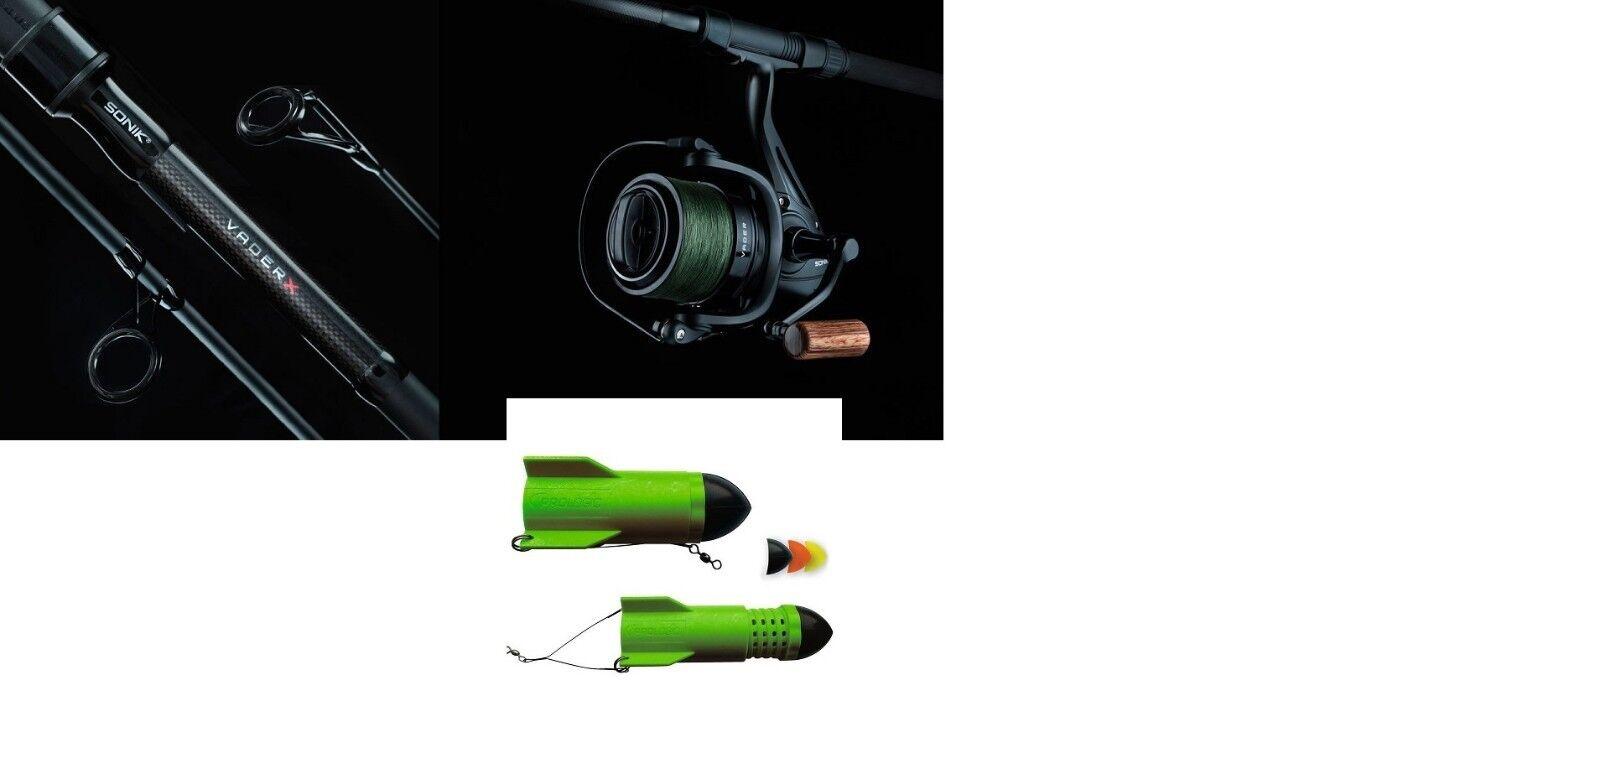 Sonik Vader X NEW 12ft  Spod Marker Rod + Spod Reel With Braid  + Prologic Spod